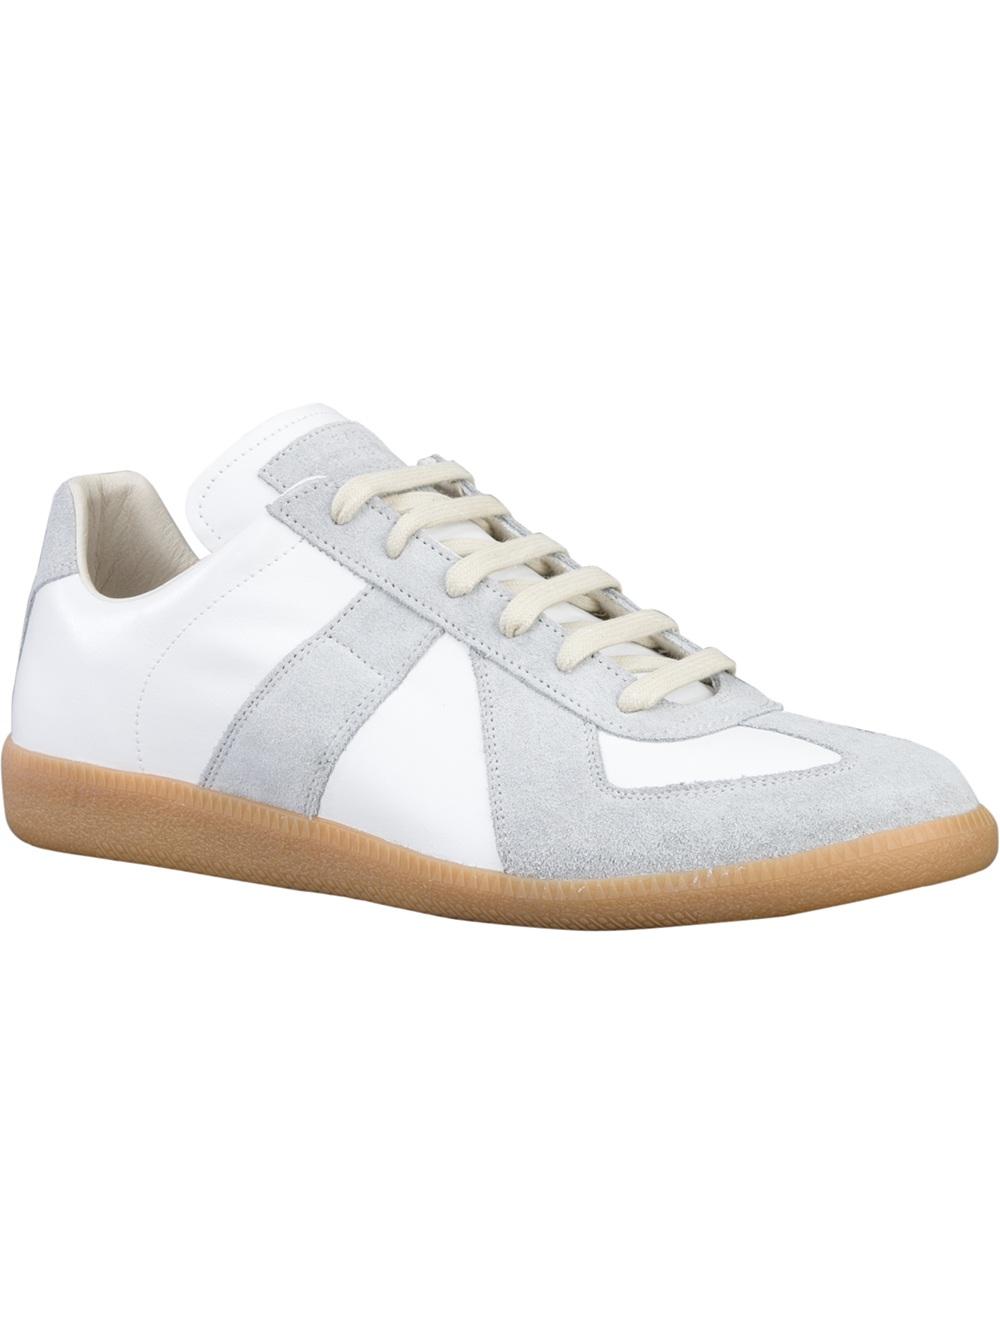 Maison margiela 70s replica sneaker in white for men lyst for Maison martin margiela replica